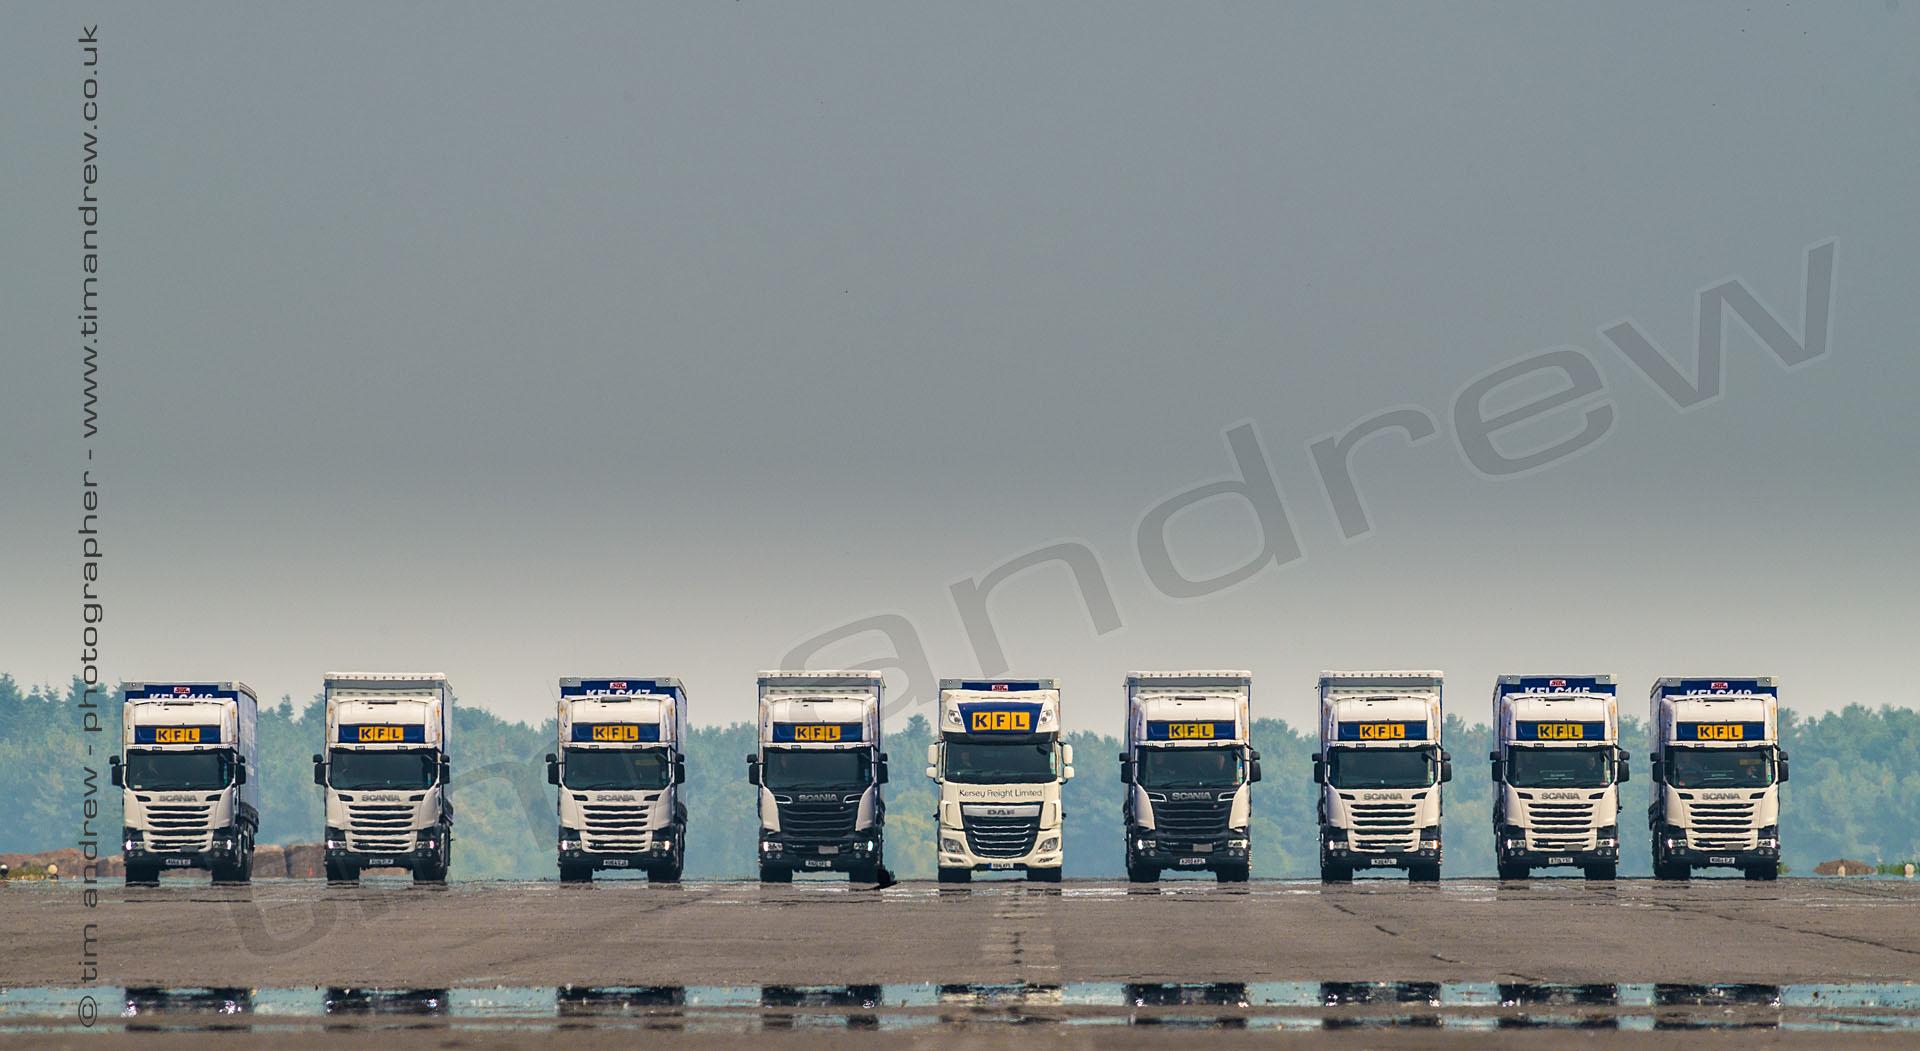 Kersey Freight Scania trucks